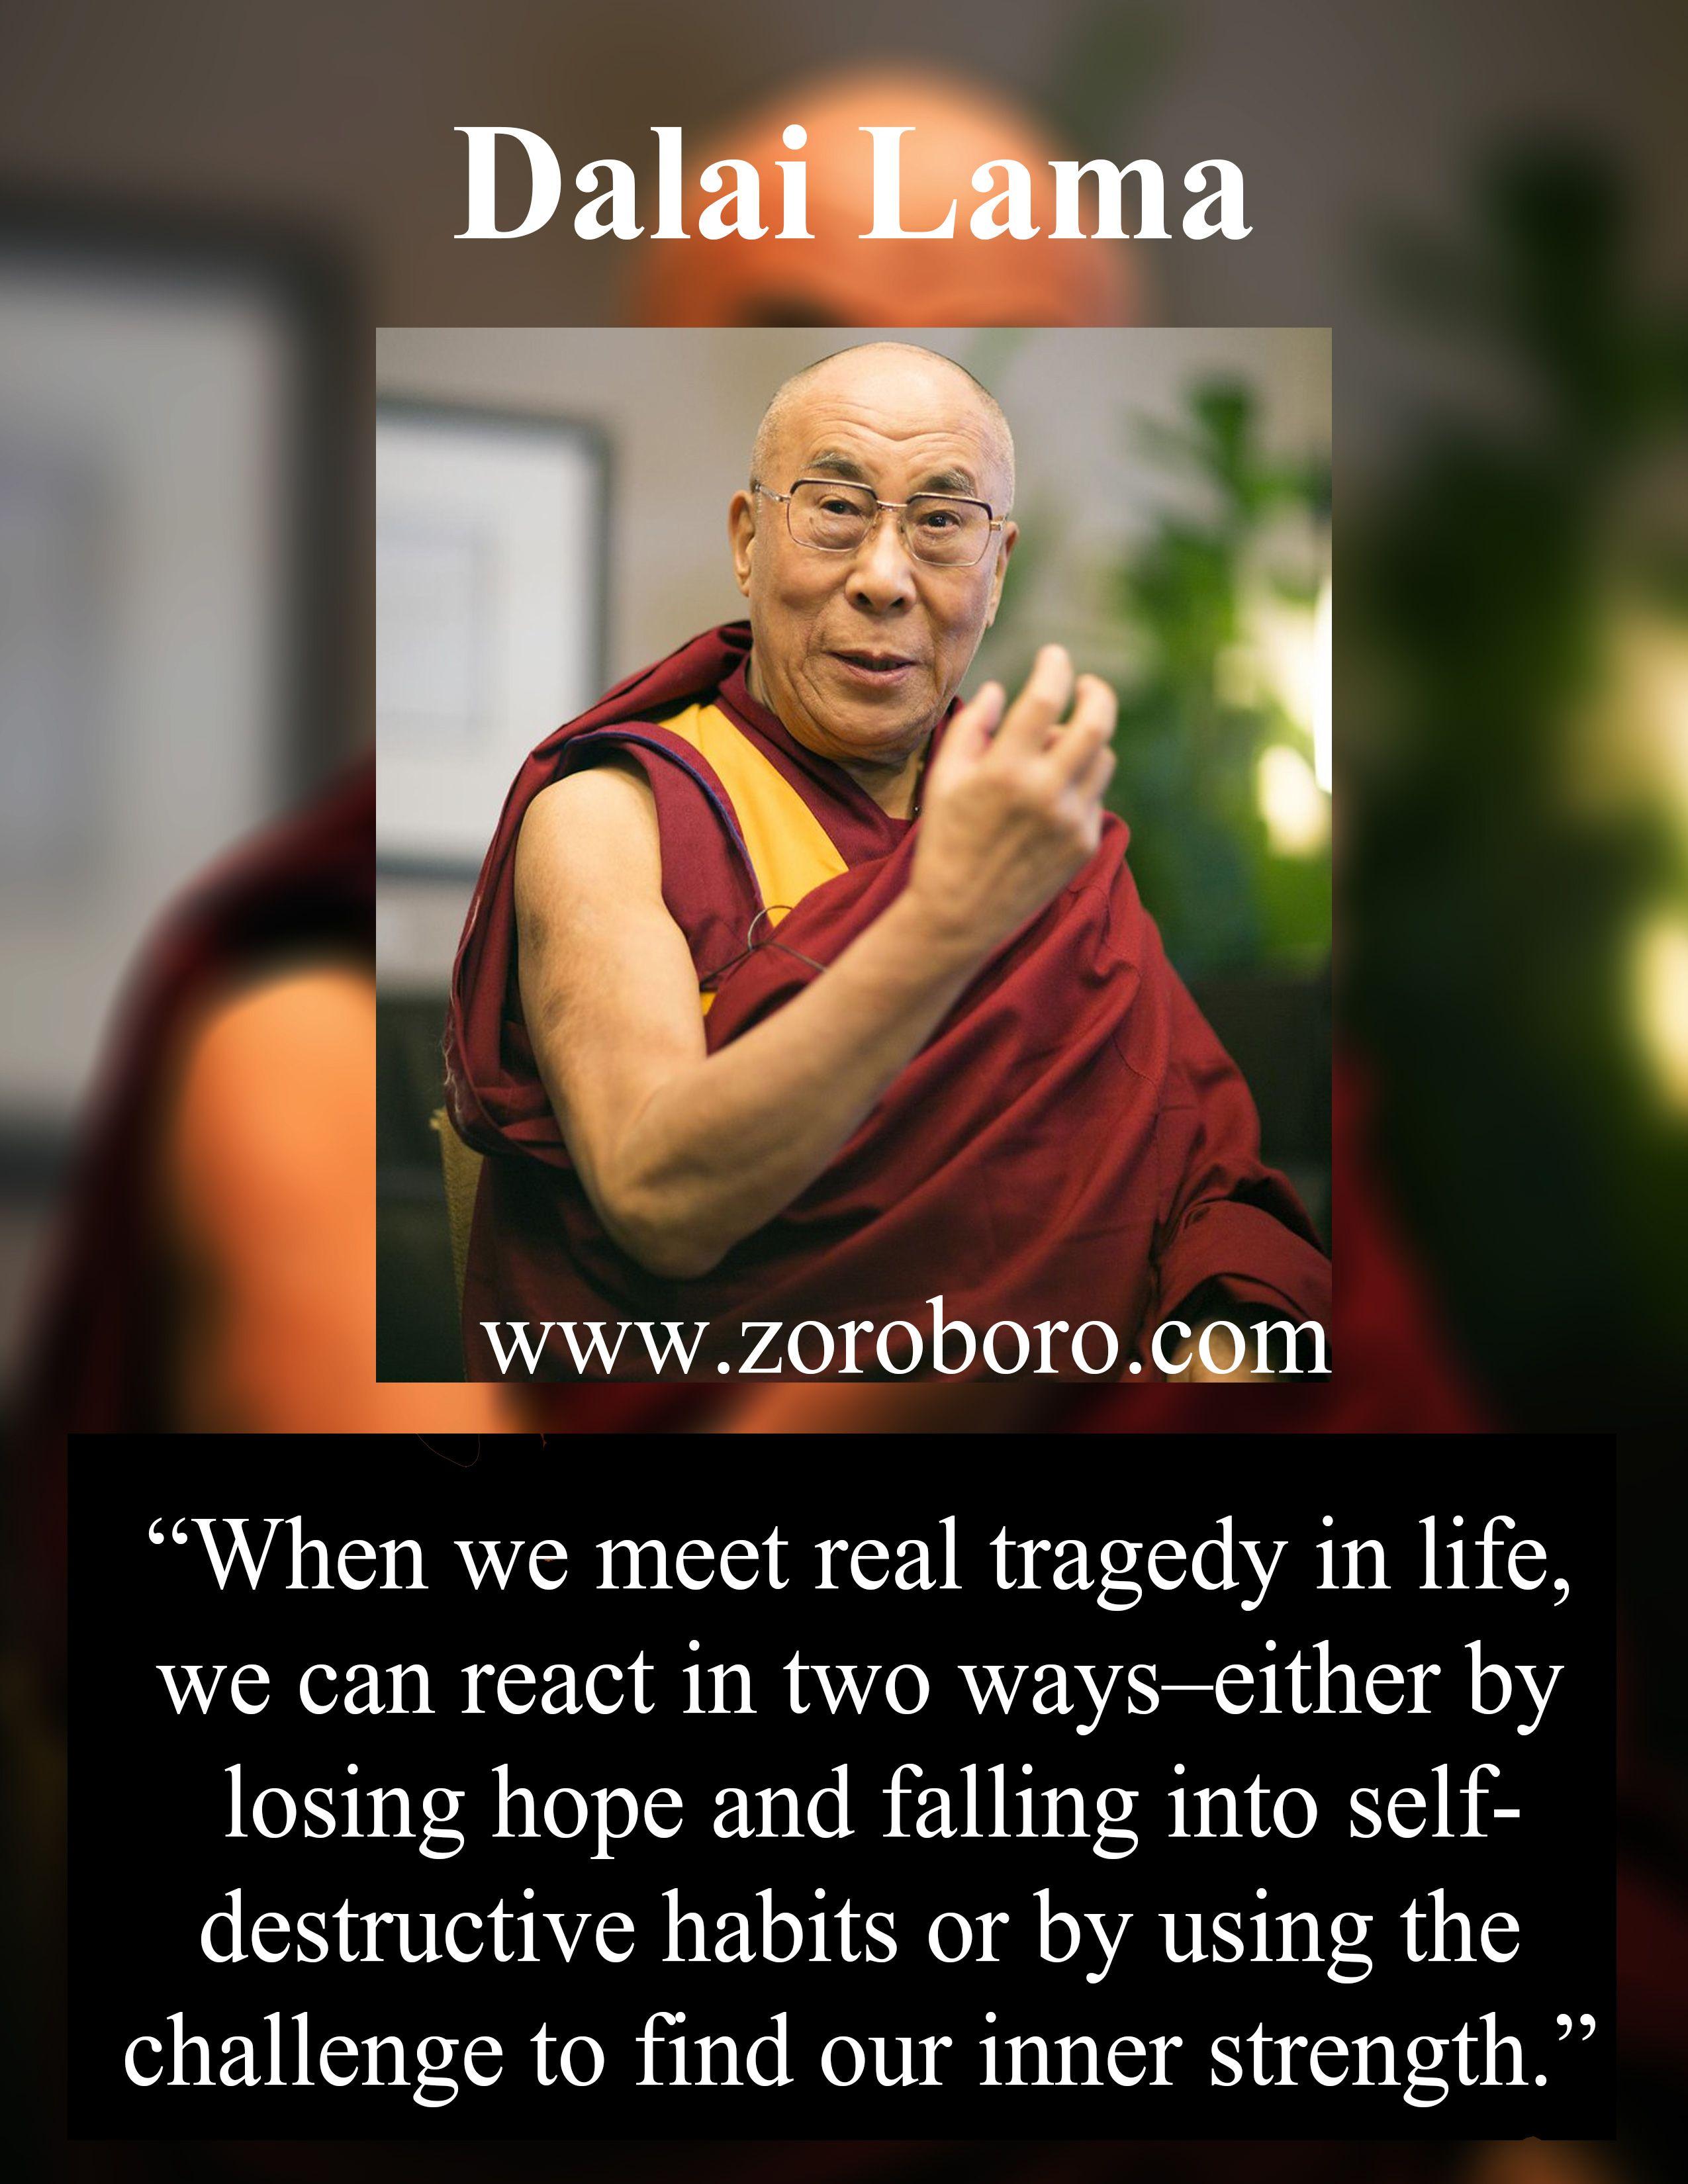 Dalai Lama Positive Quotes